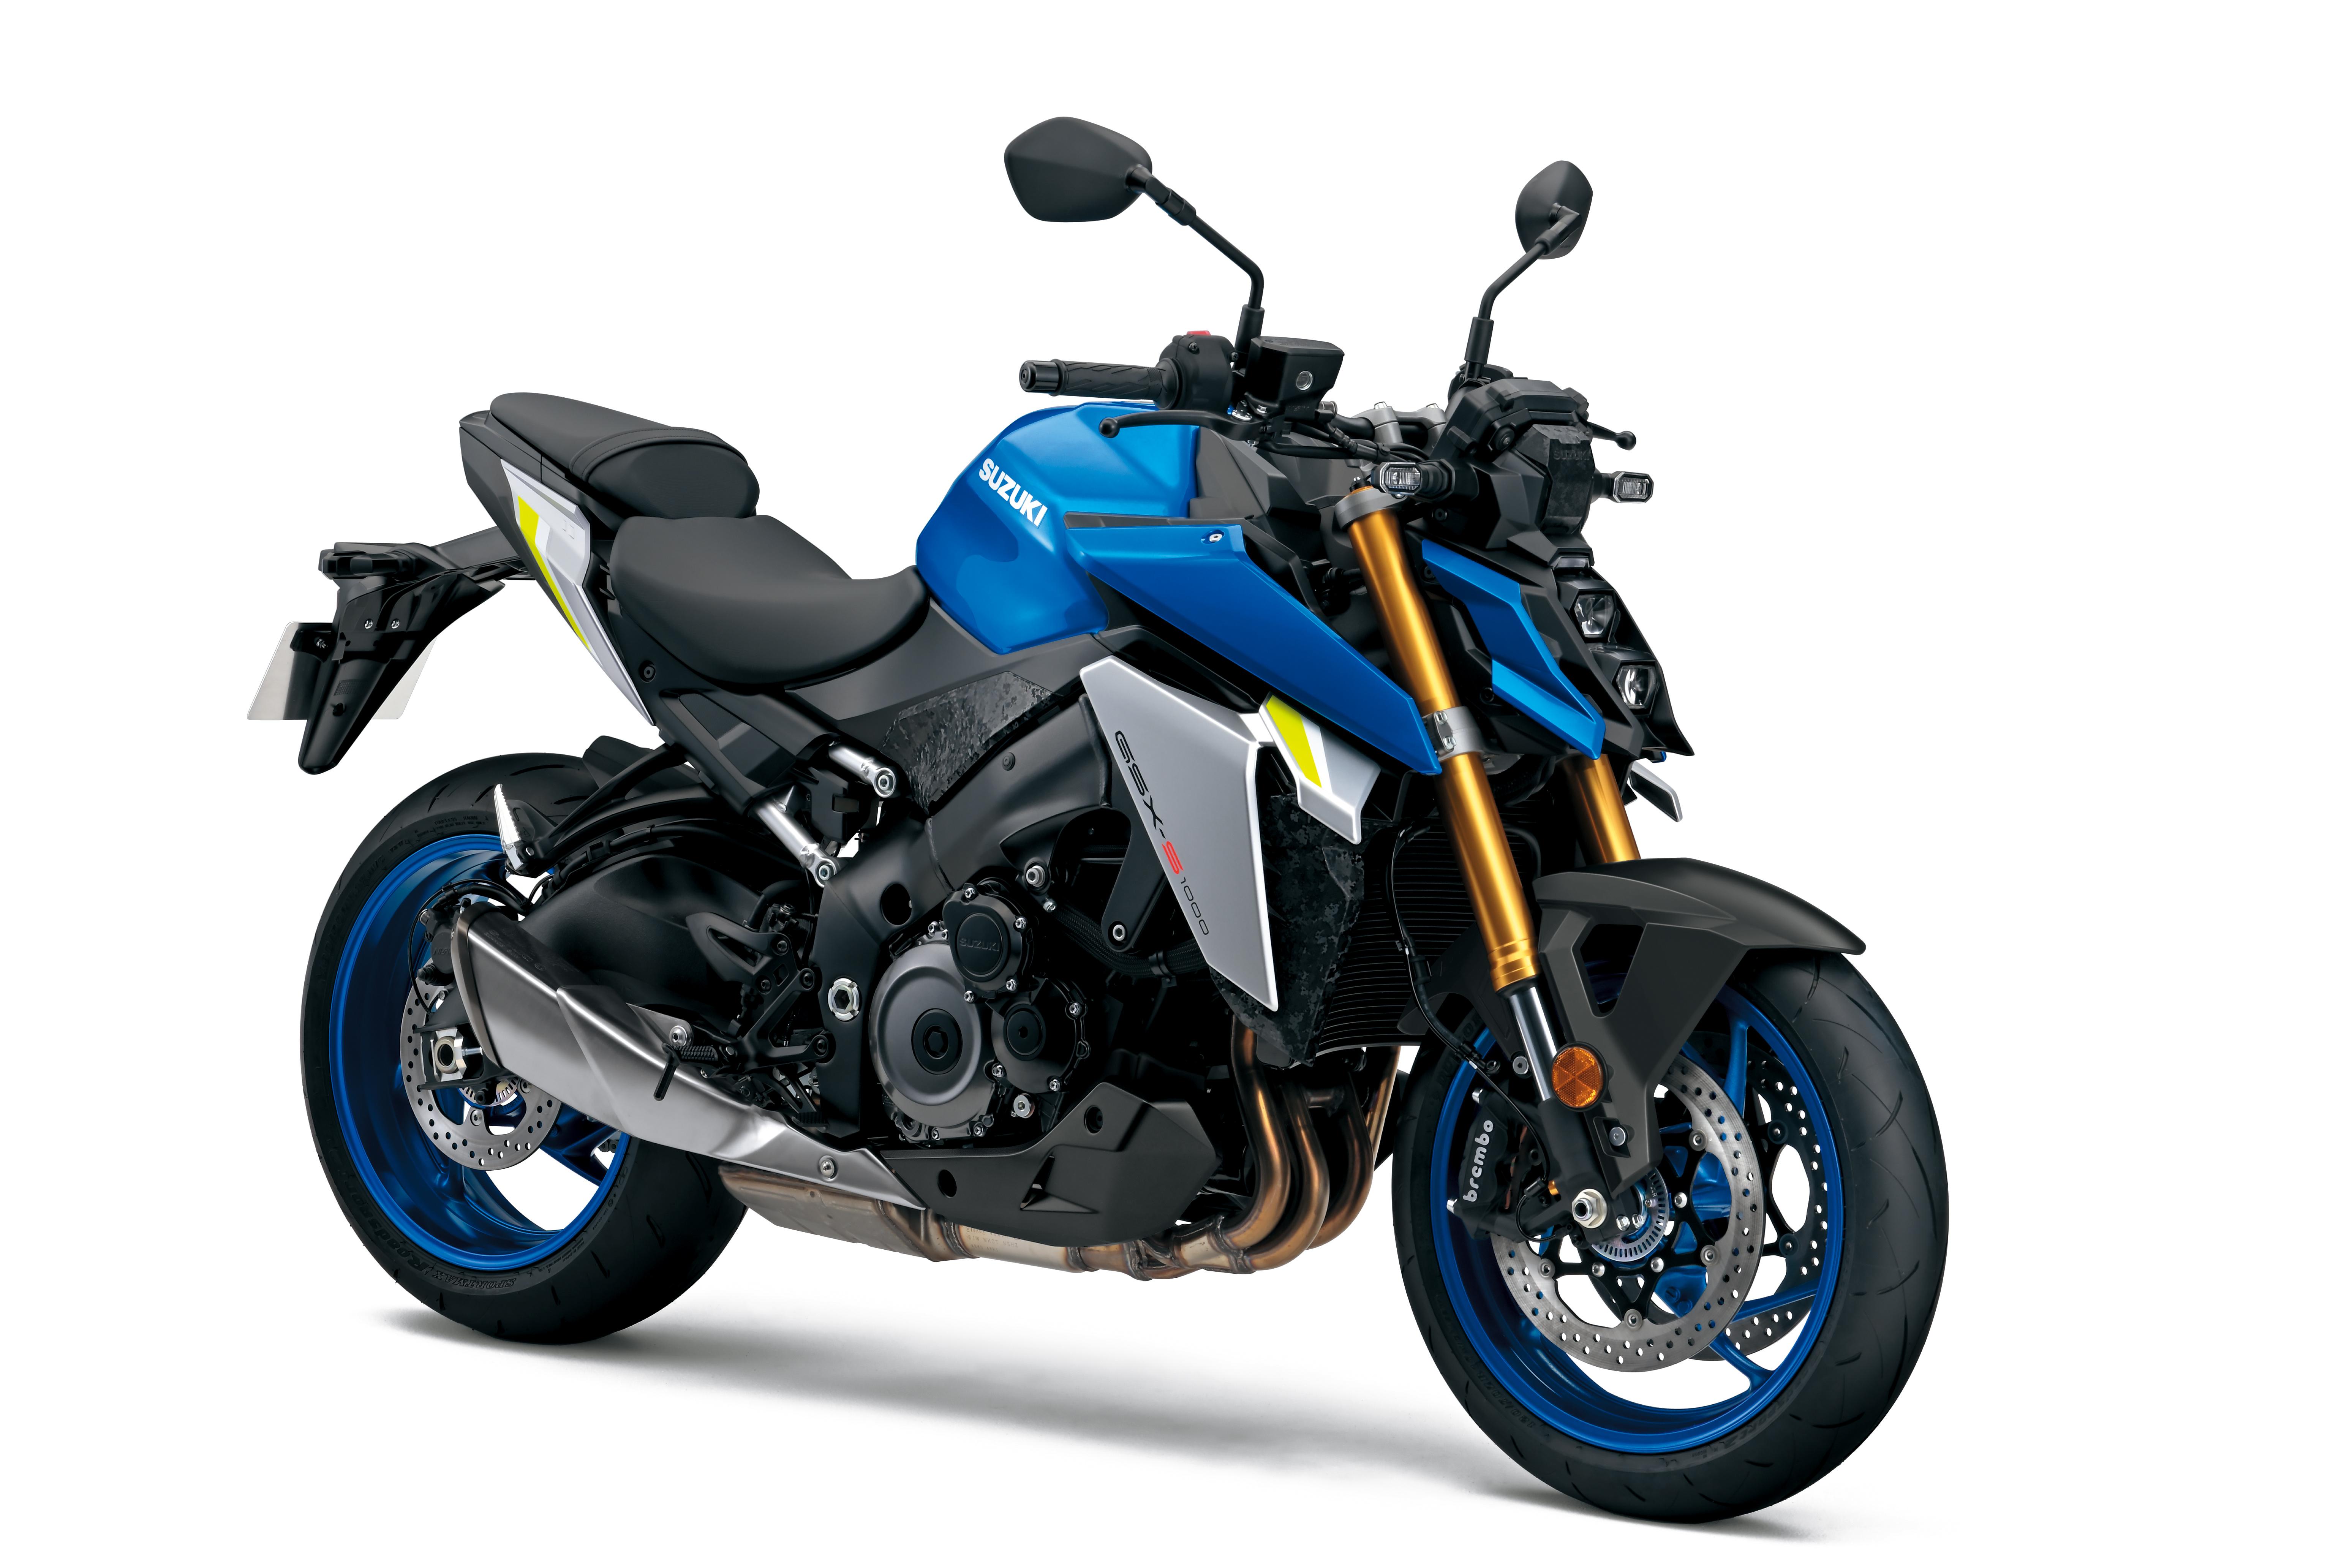 Metallic Triton Blue (YSF) GSX-S1000 2021 Model